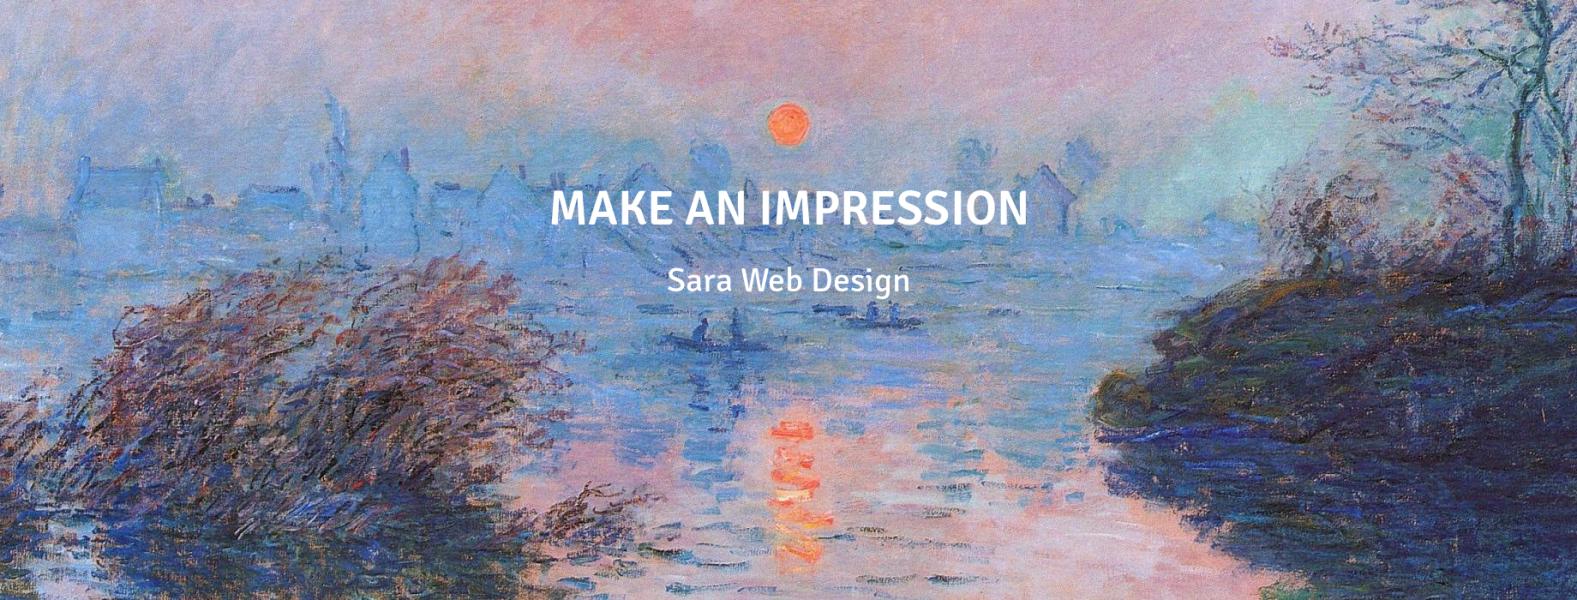 Sara Web Design